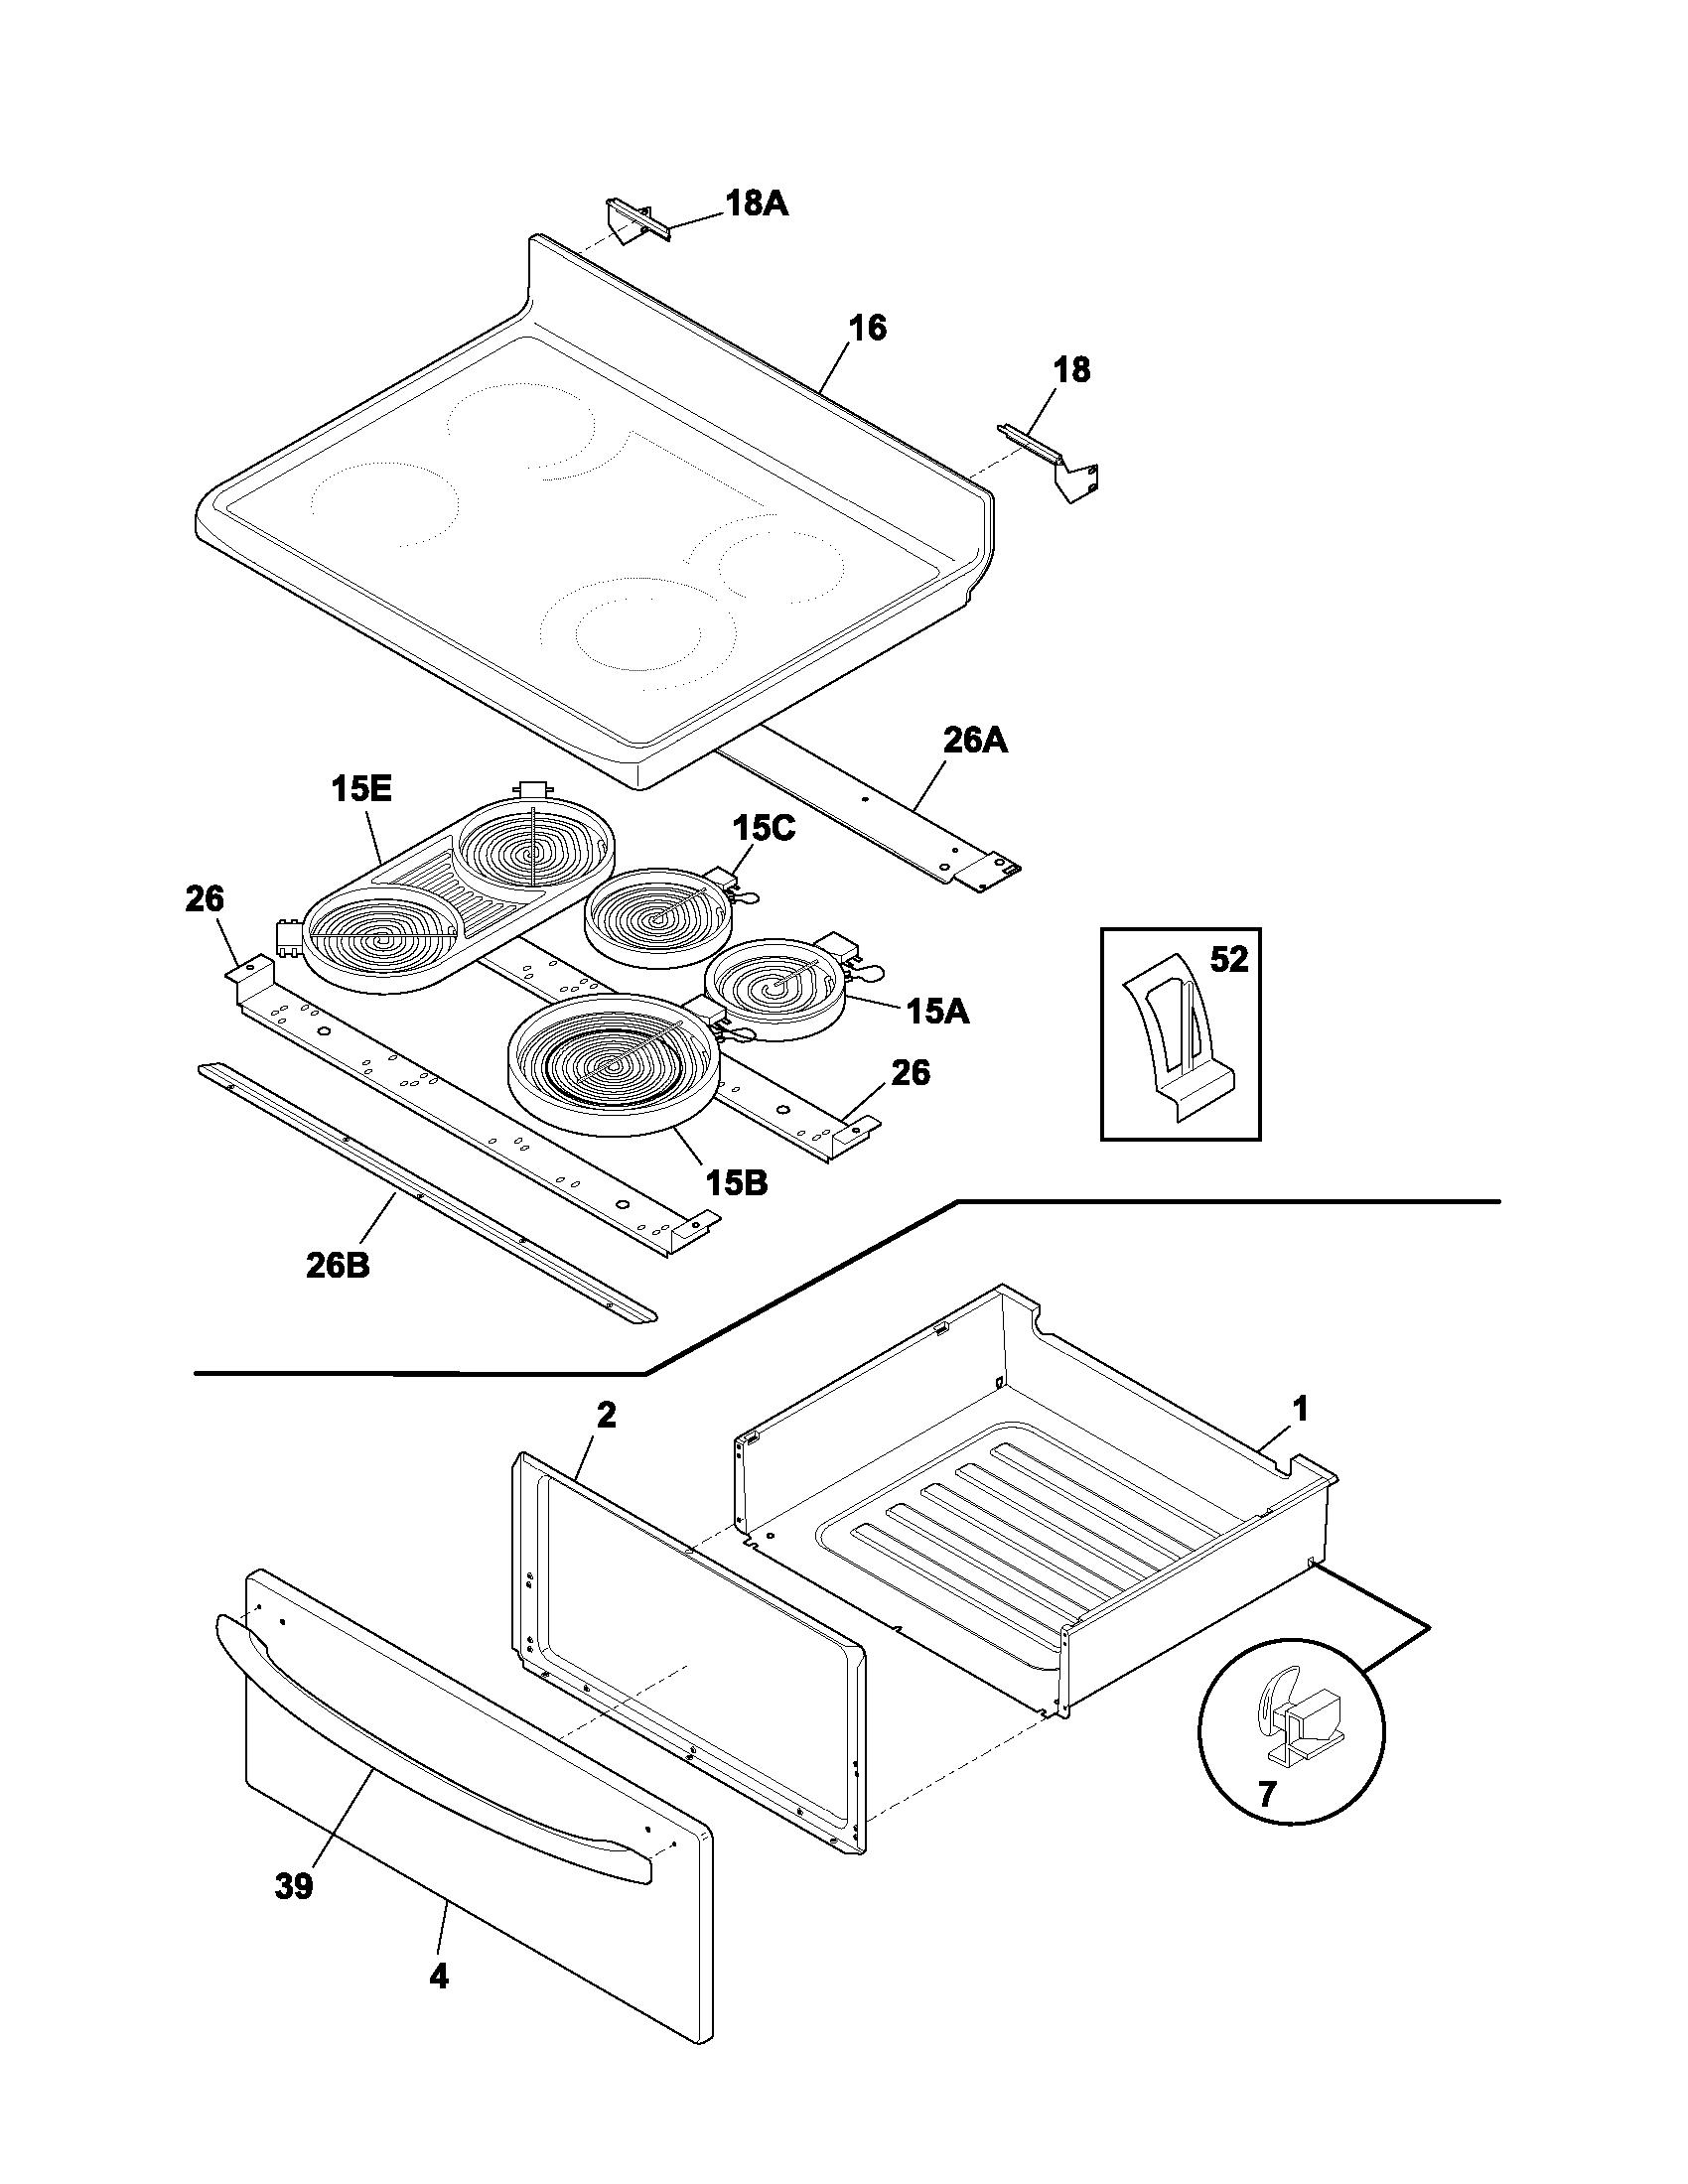 dishwasher wiring diagrams whirlpool plant apical meristem diagram fefl88acc electric range timer stove clocks